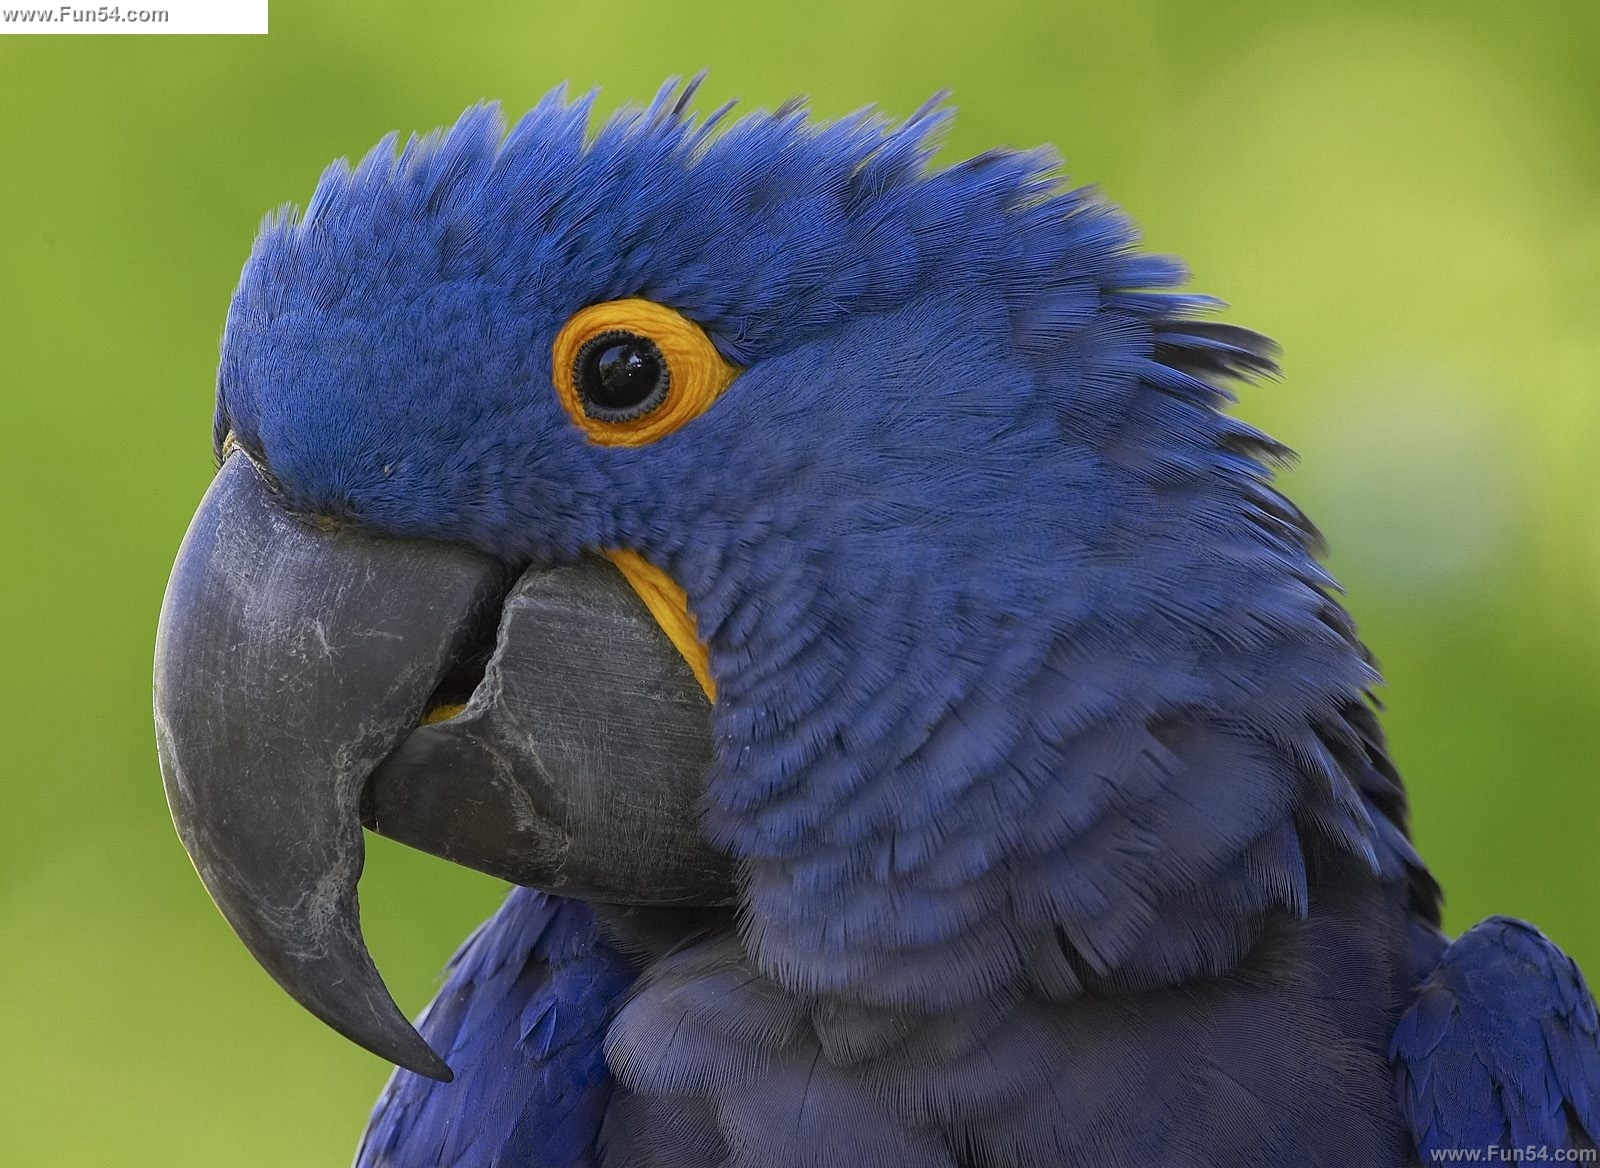 Funny Blue parrot Desktop wallpaper Funny Animal 1600x1168